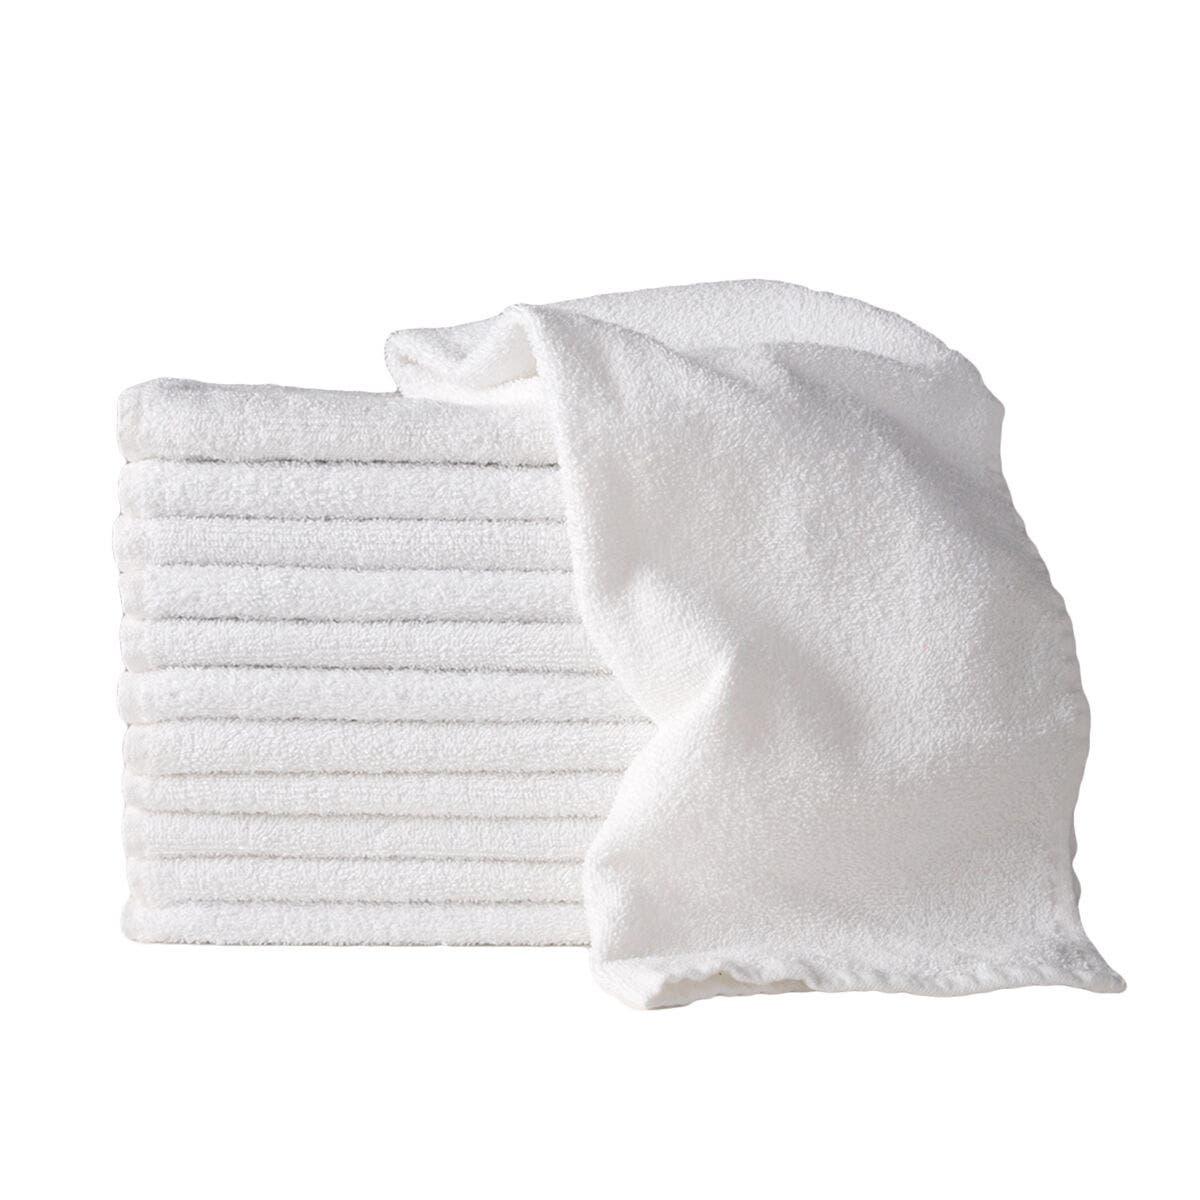 10 x 100g WHITE Sydney Salon Supplies 100% Cotton Hand Towels Salon/Barber/Beauty/Gym/Hotel 35x75cm